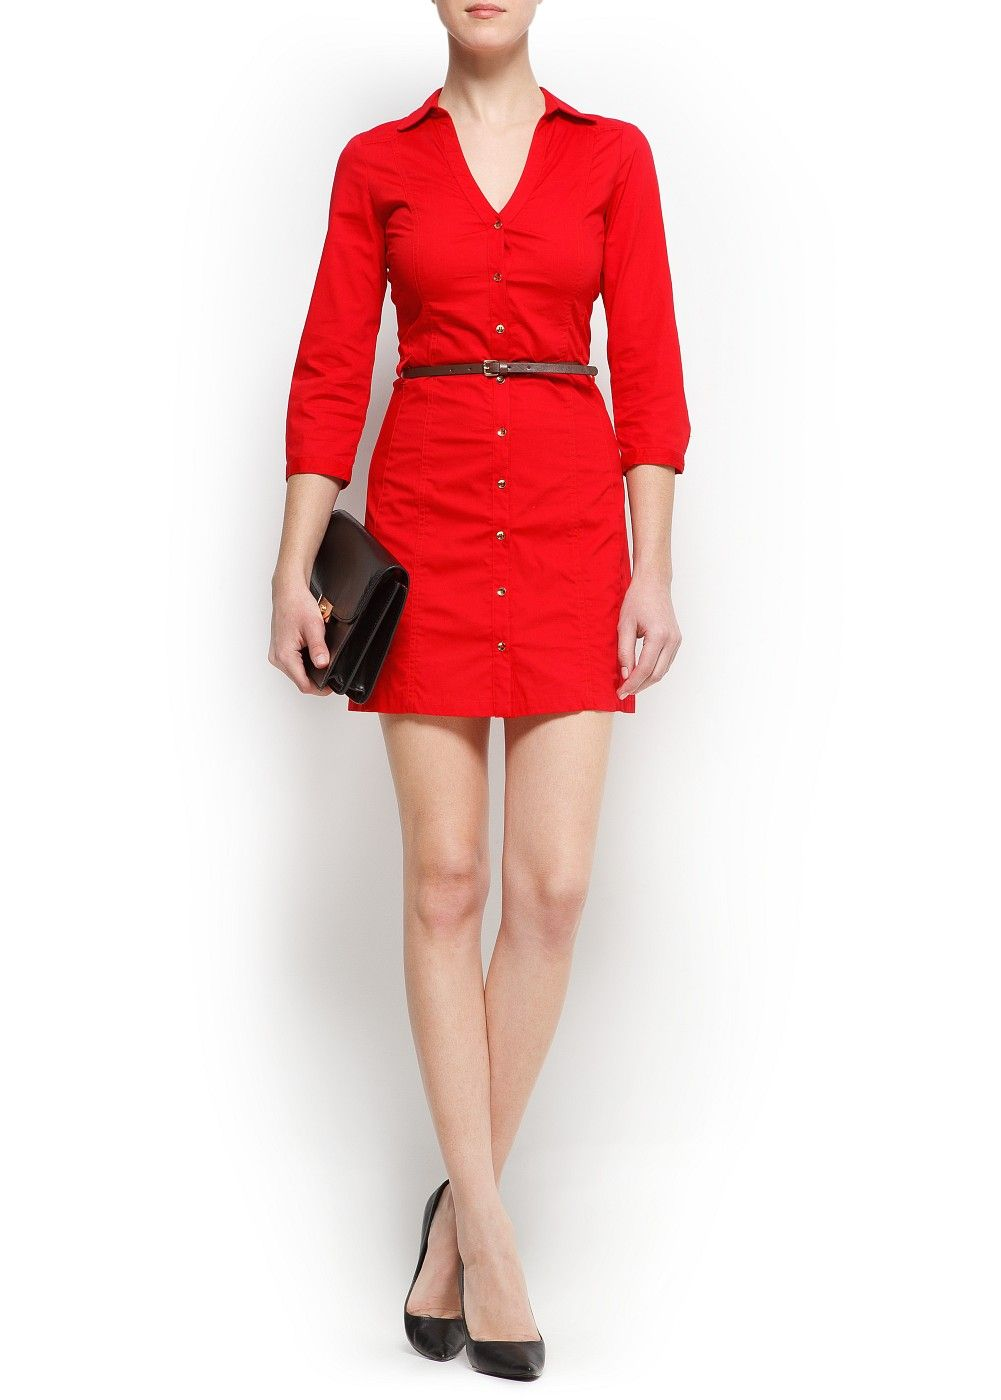 MANGO - PRENDAS - Vestidos - Vestido camisero